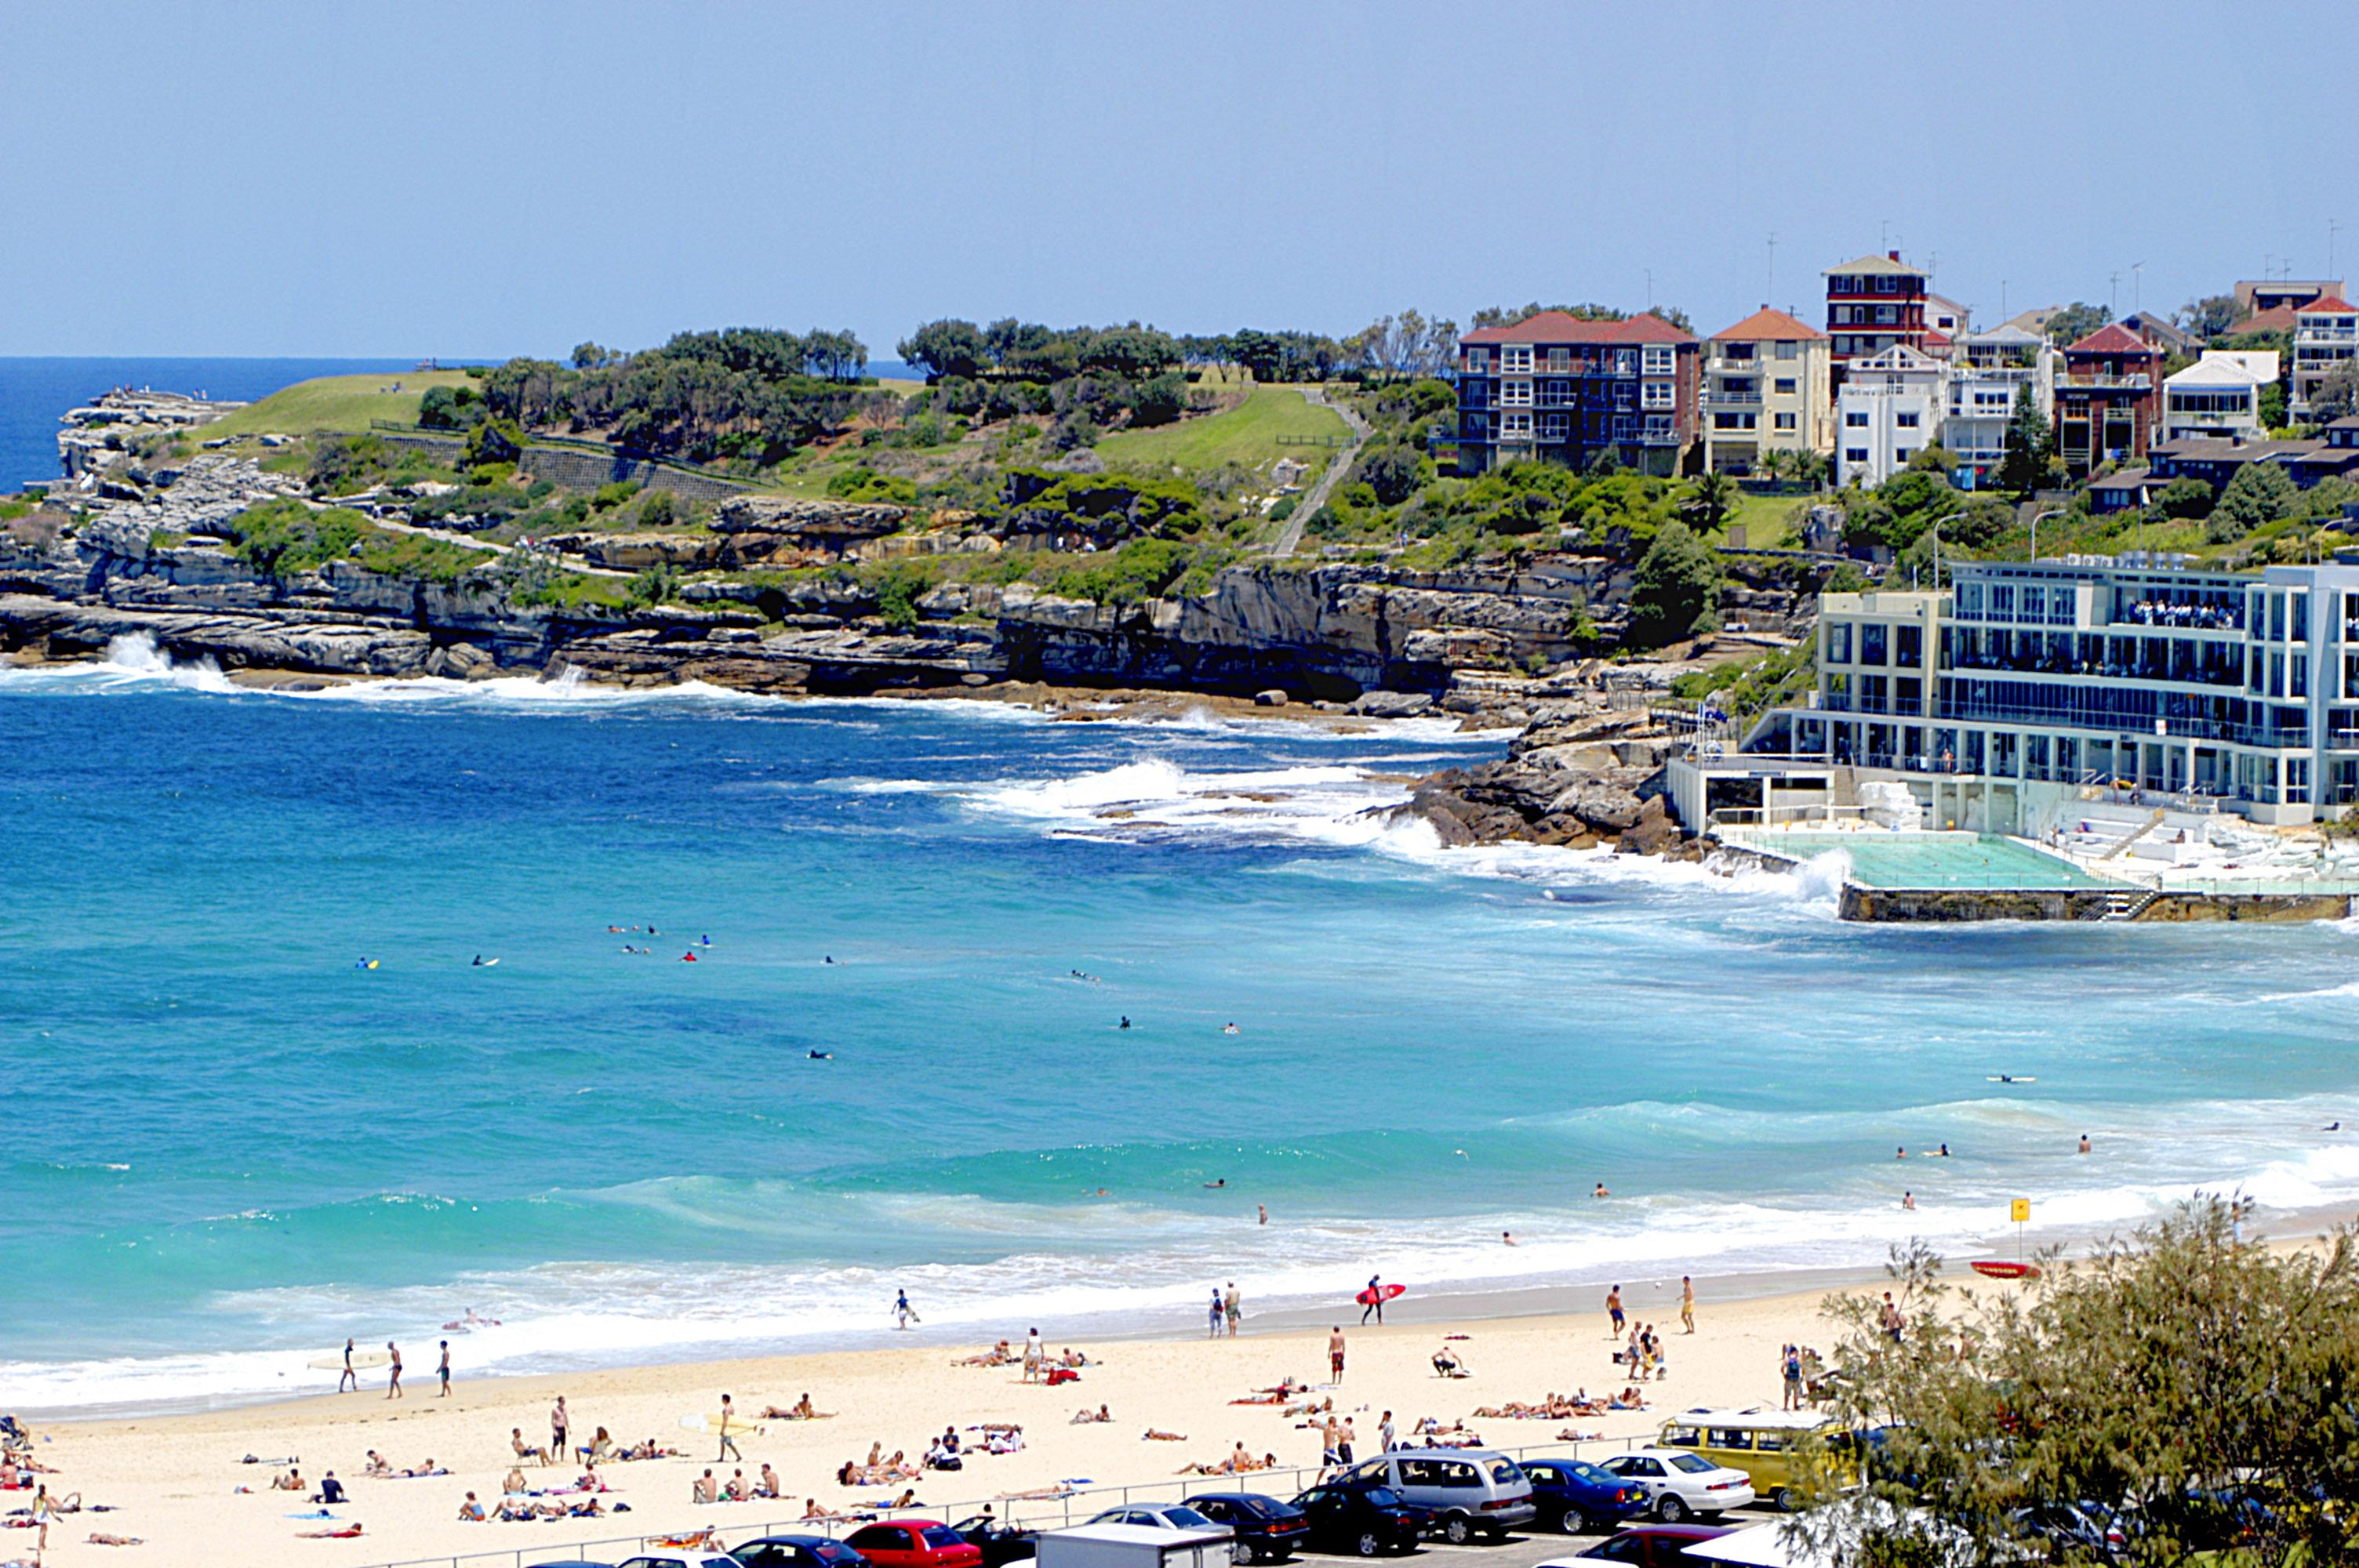 Bondi-Beach-Wonders-of-Soft-White-Sand-Make-This-Beach-is-Spectacular